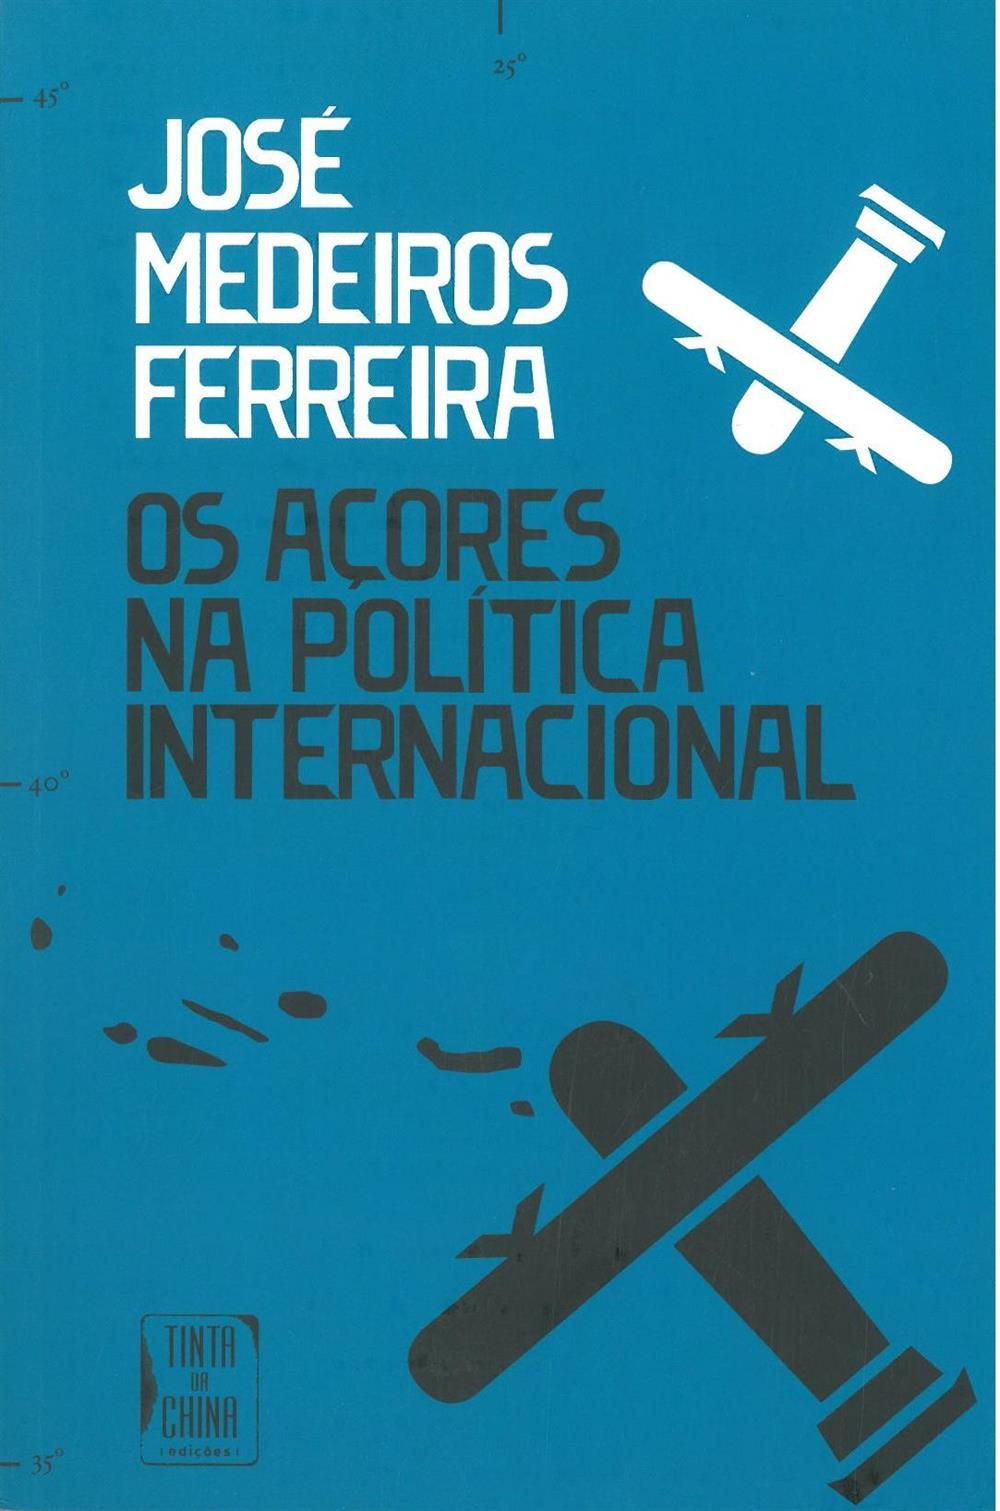 Os Açores na política internacional.jpg